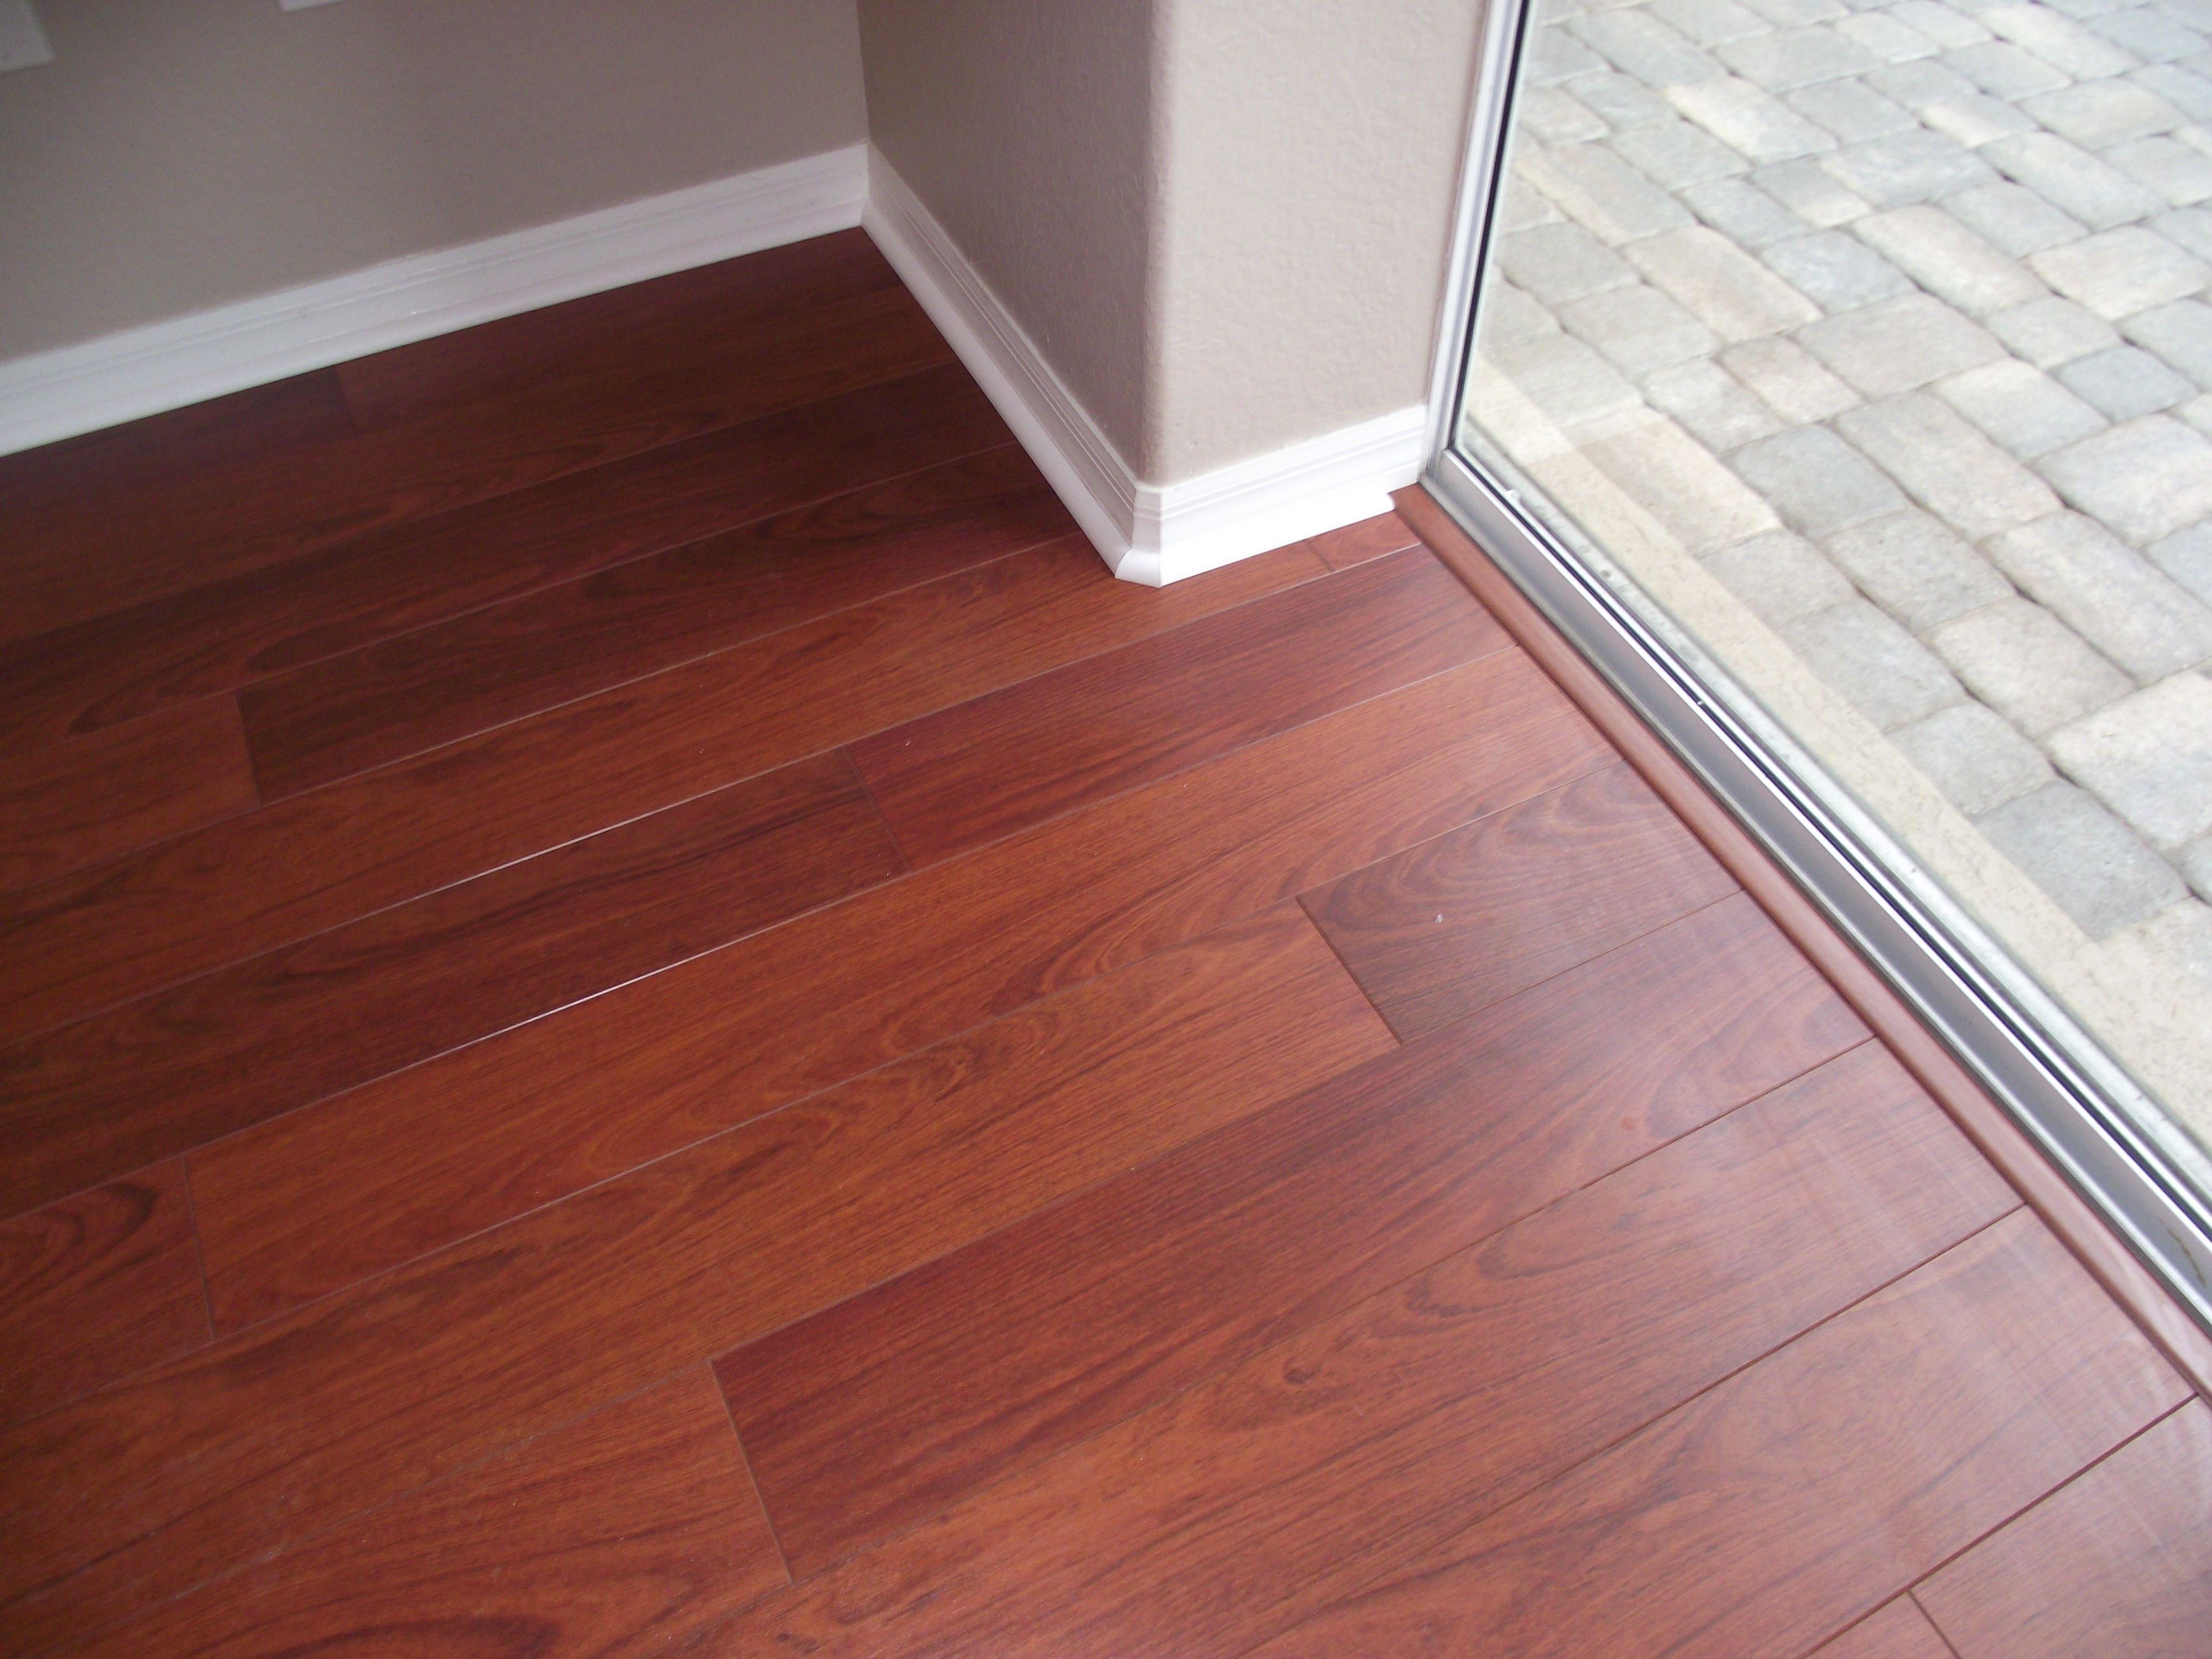 Finished Laminate Flooring At Sliding Glass Door.